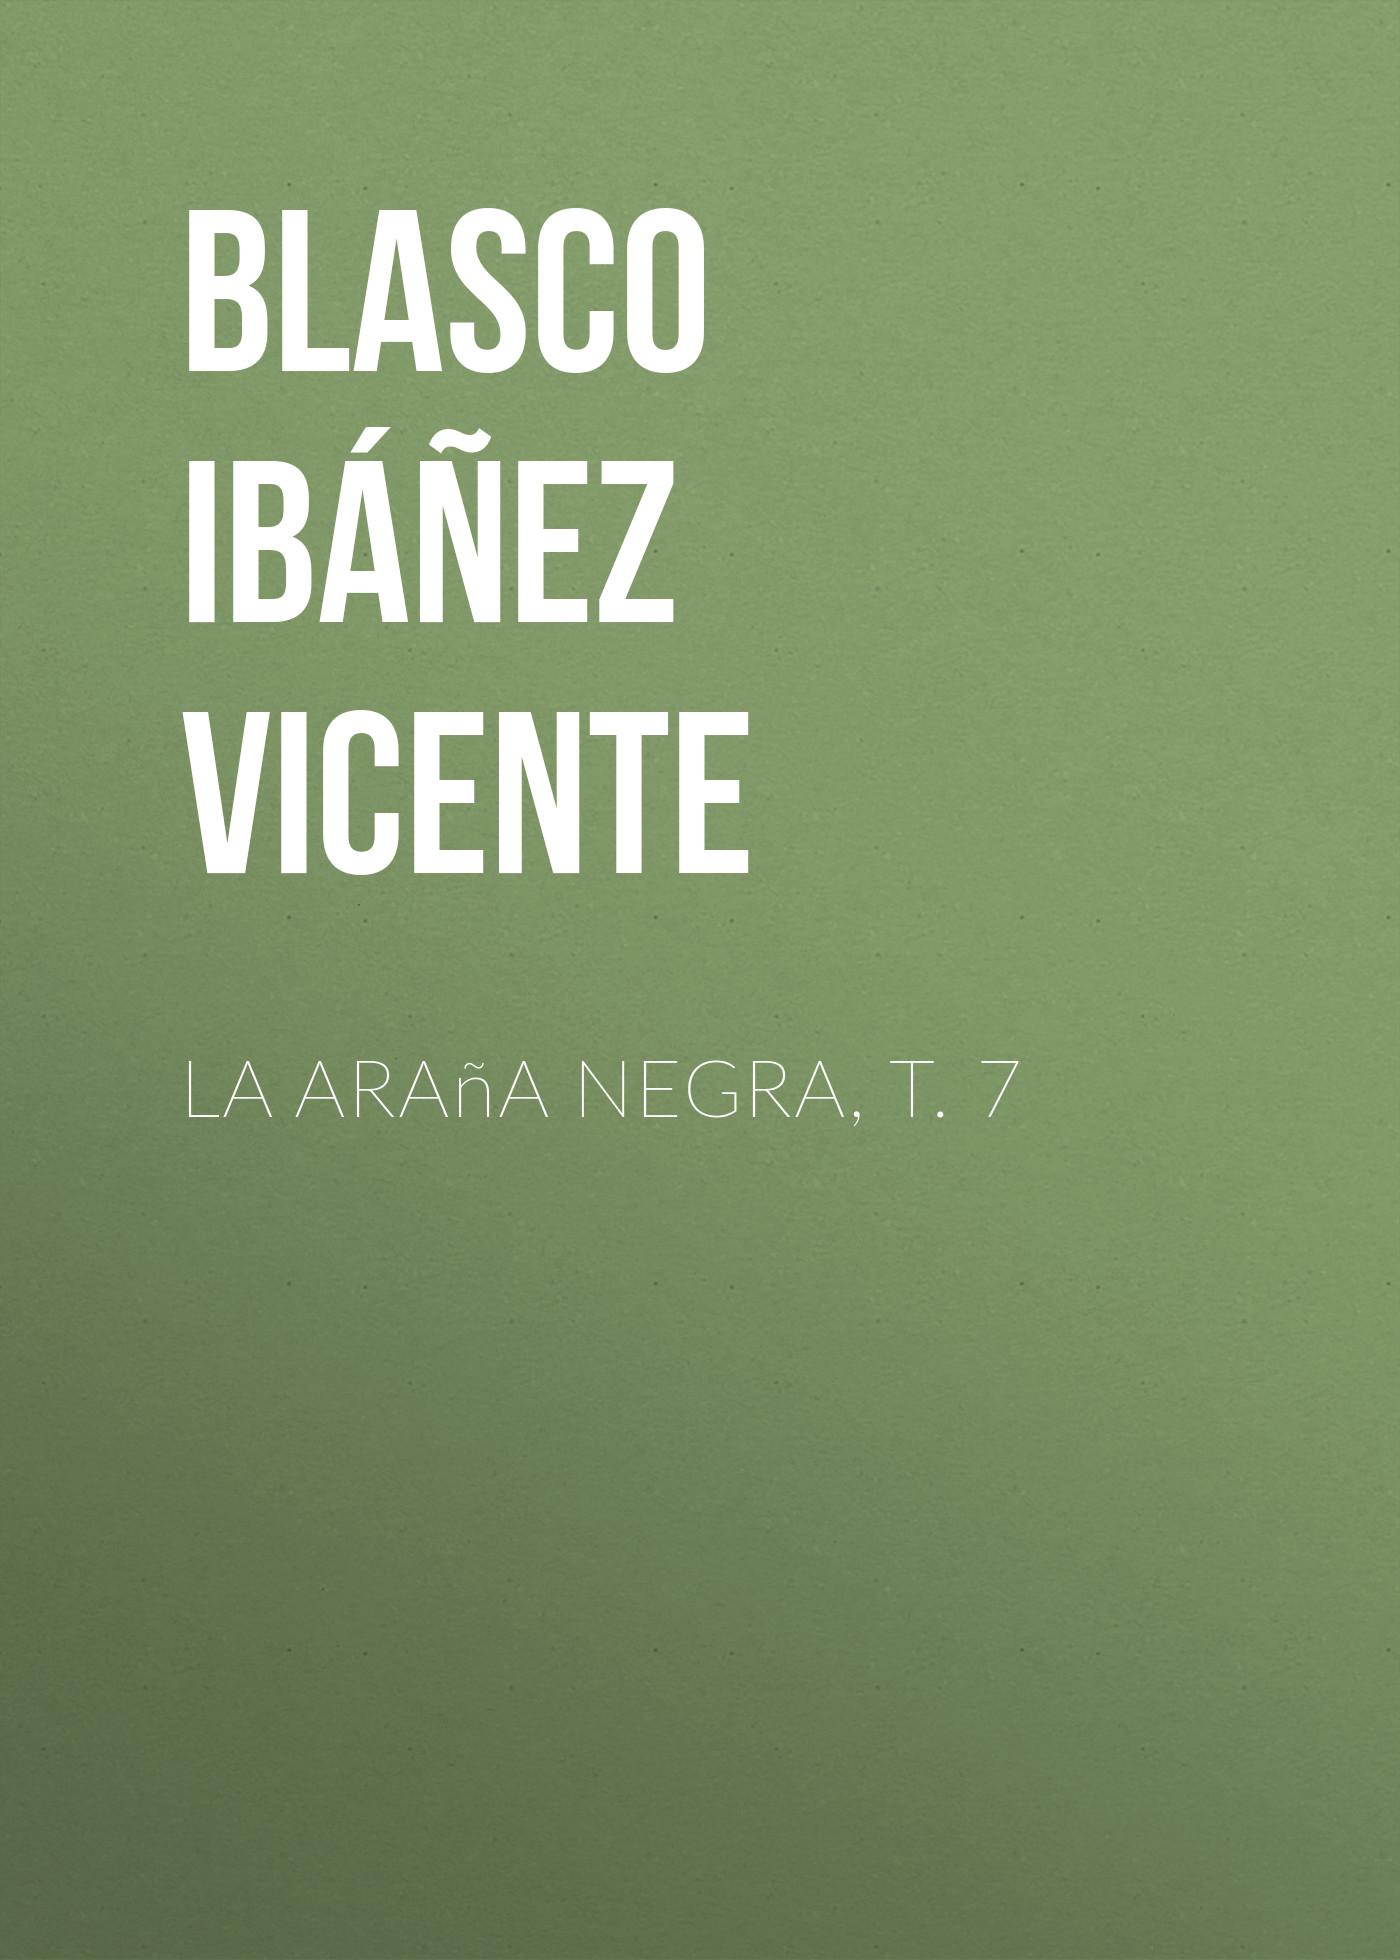 Blasco Ibáñez Vicente La araña negra, t. 7 blasco ibáñez vicente la araña negra t 1